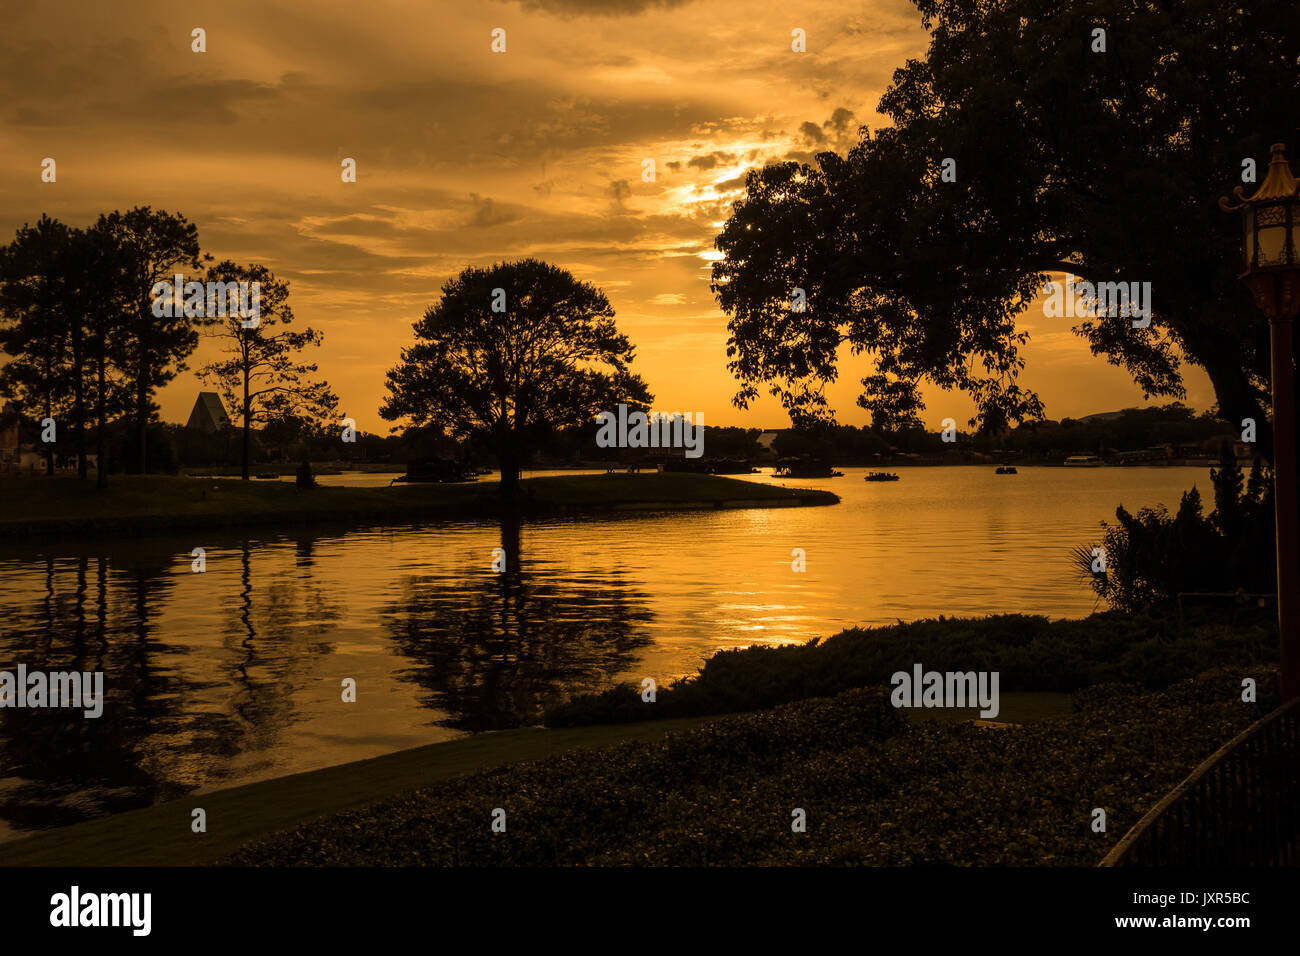 World Showcase Lagoon at sunset in Epcot, Walt Disney World, Orlando, Florida. - Stock Image